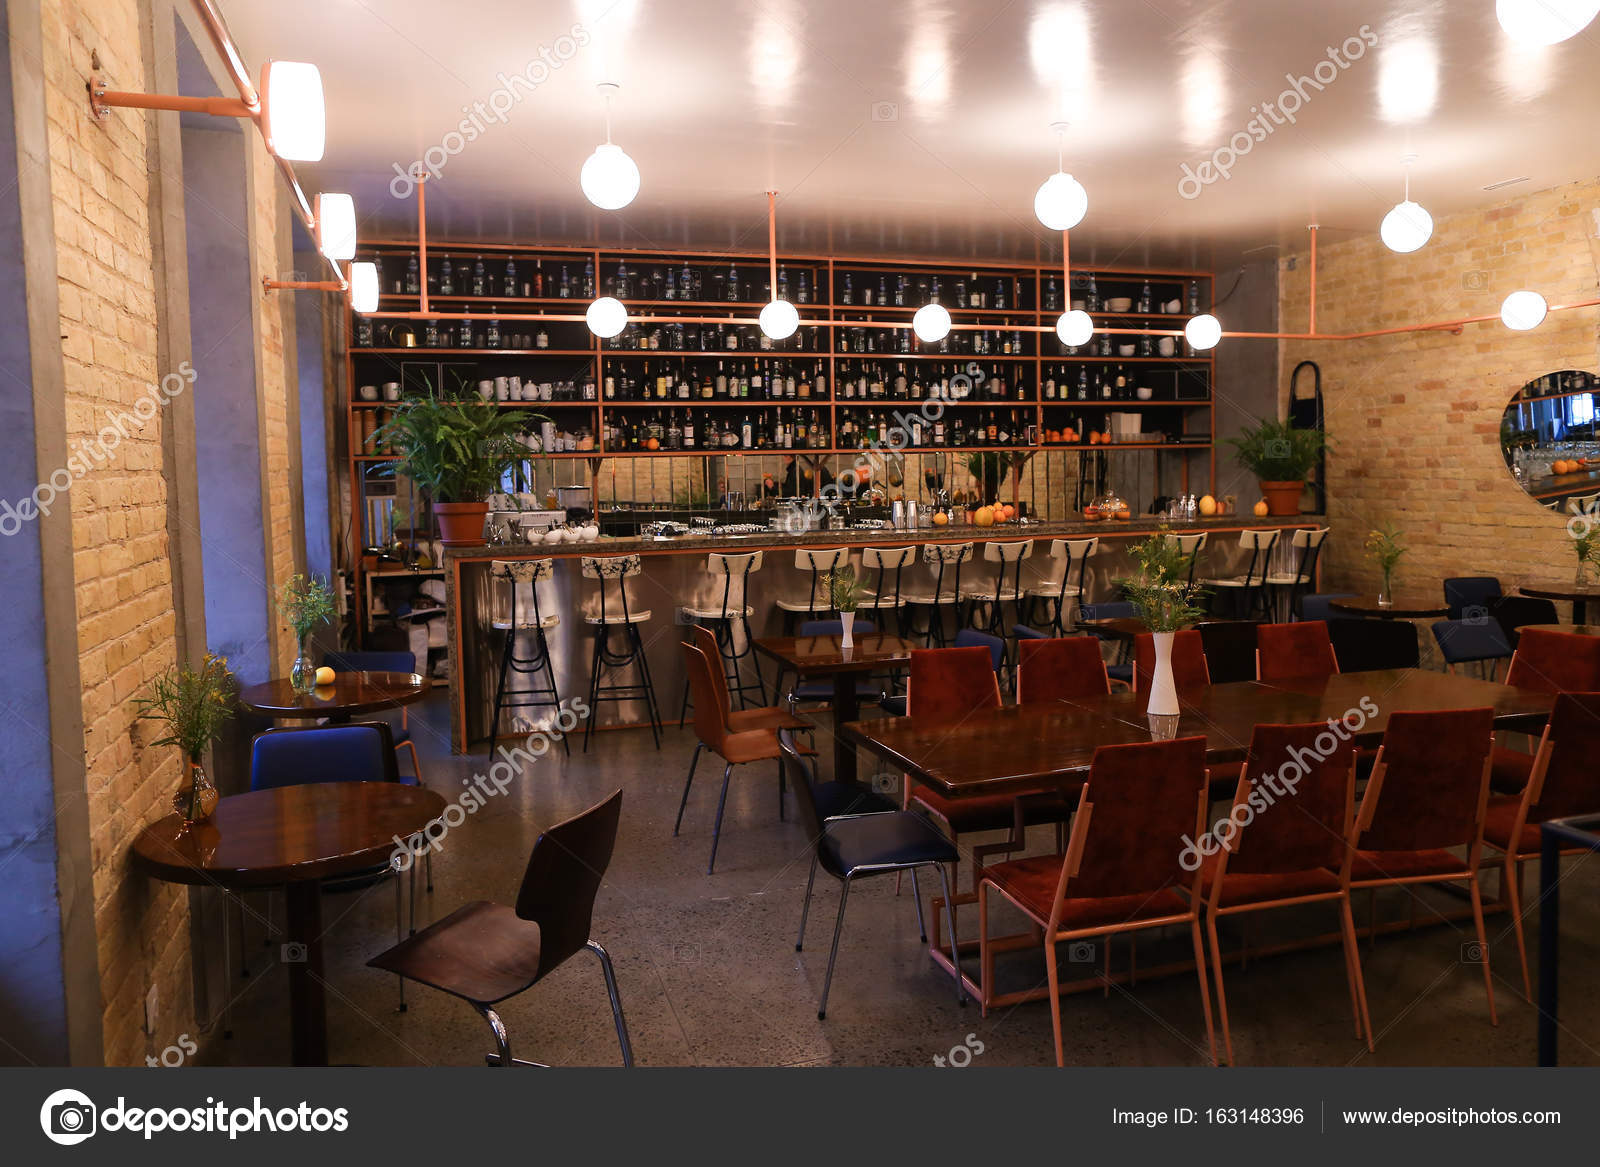 Restaurant Bar Decor Ideas Capture Design Ideas Trendy Cafe Or Restaurant Because Bar Stock Photo C Sisterspro 163148396